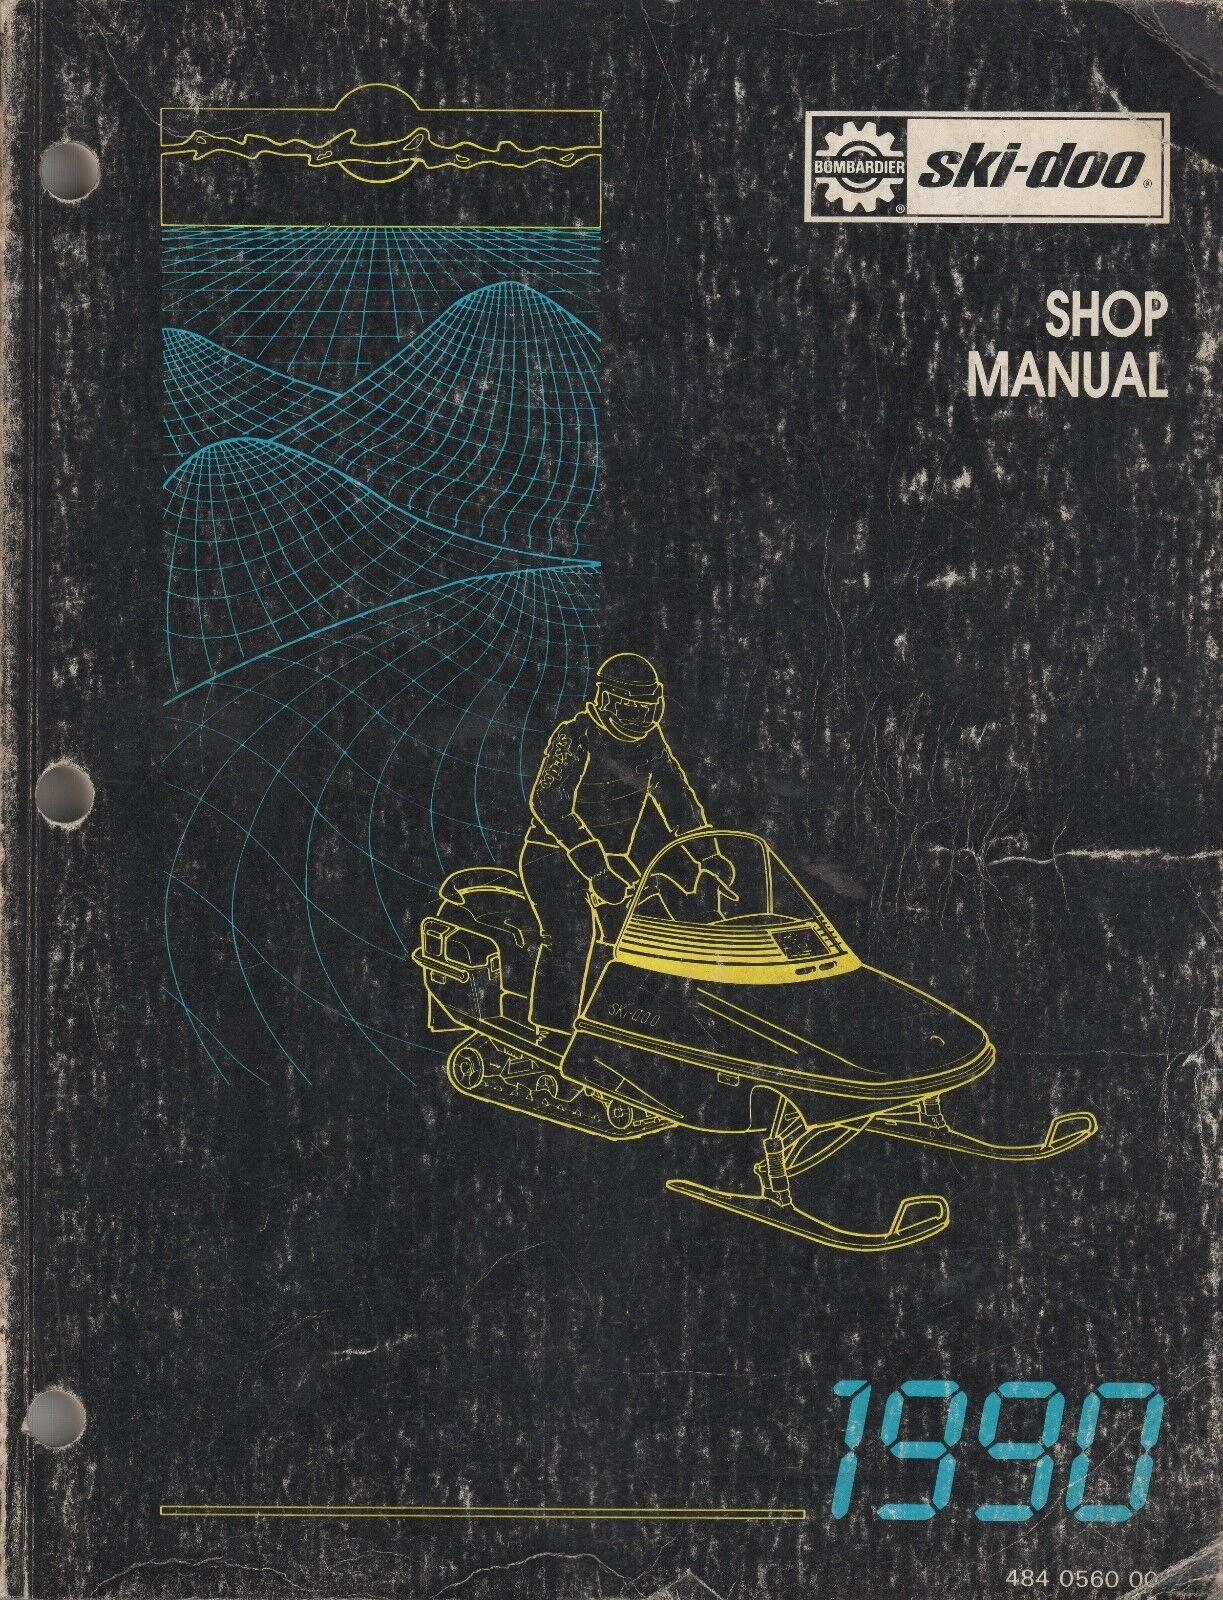 1990 SKI-DOO (see models in description) SHOP SERVICE MANUAL 484 0560 00 (425)